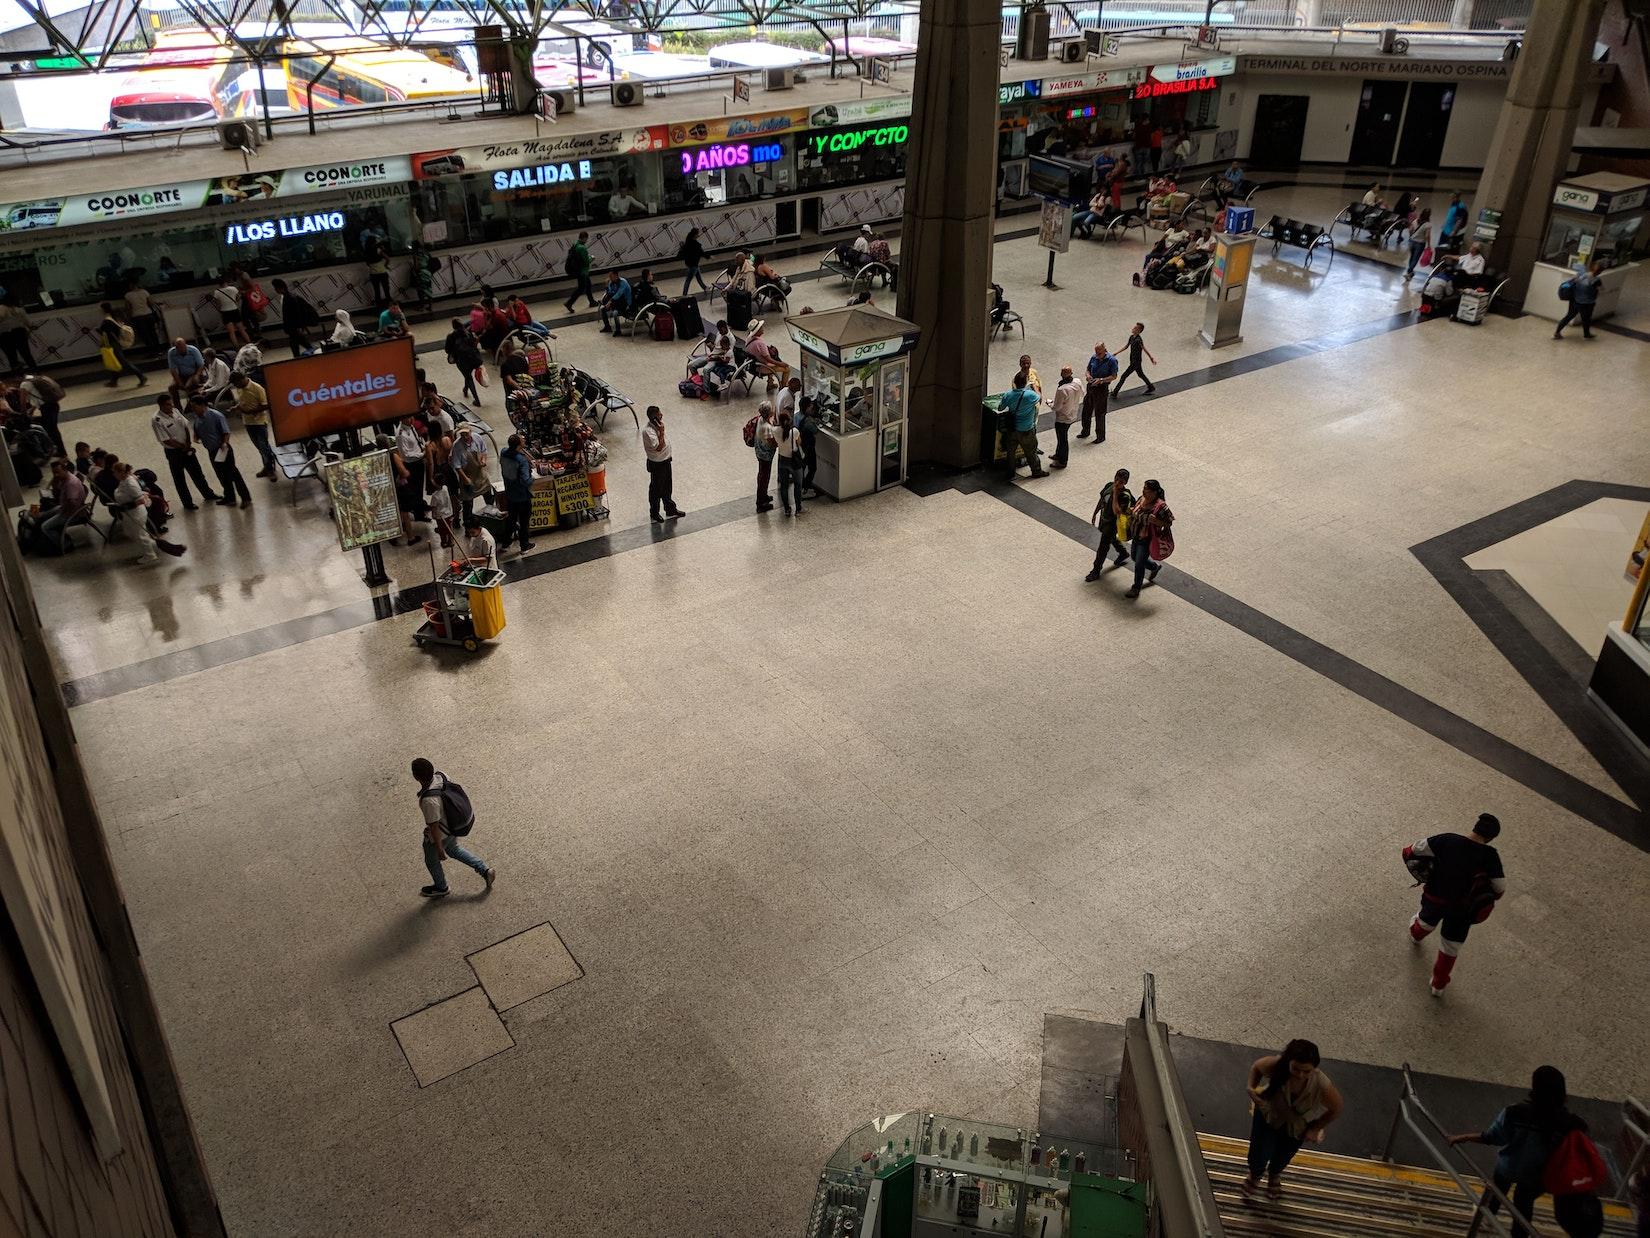 Terminal Norte in Medellin, Colombia